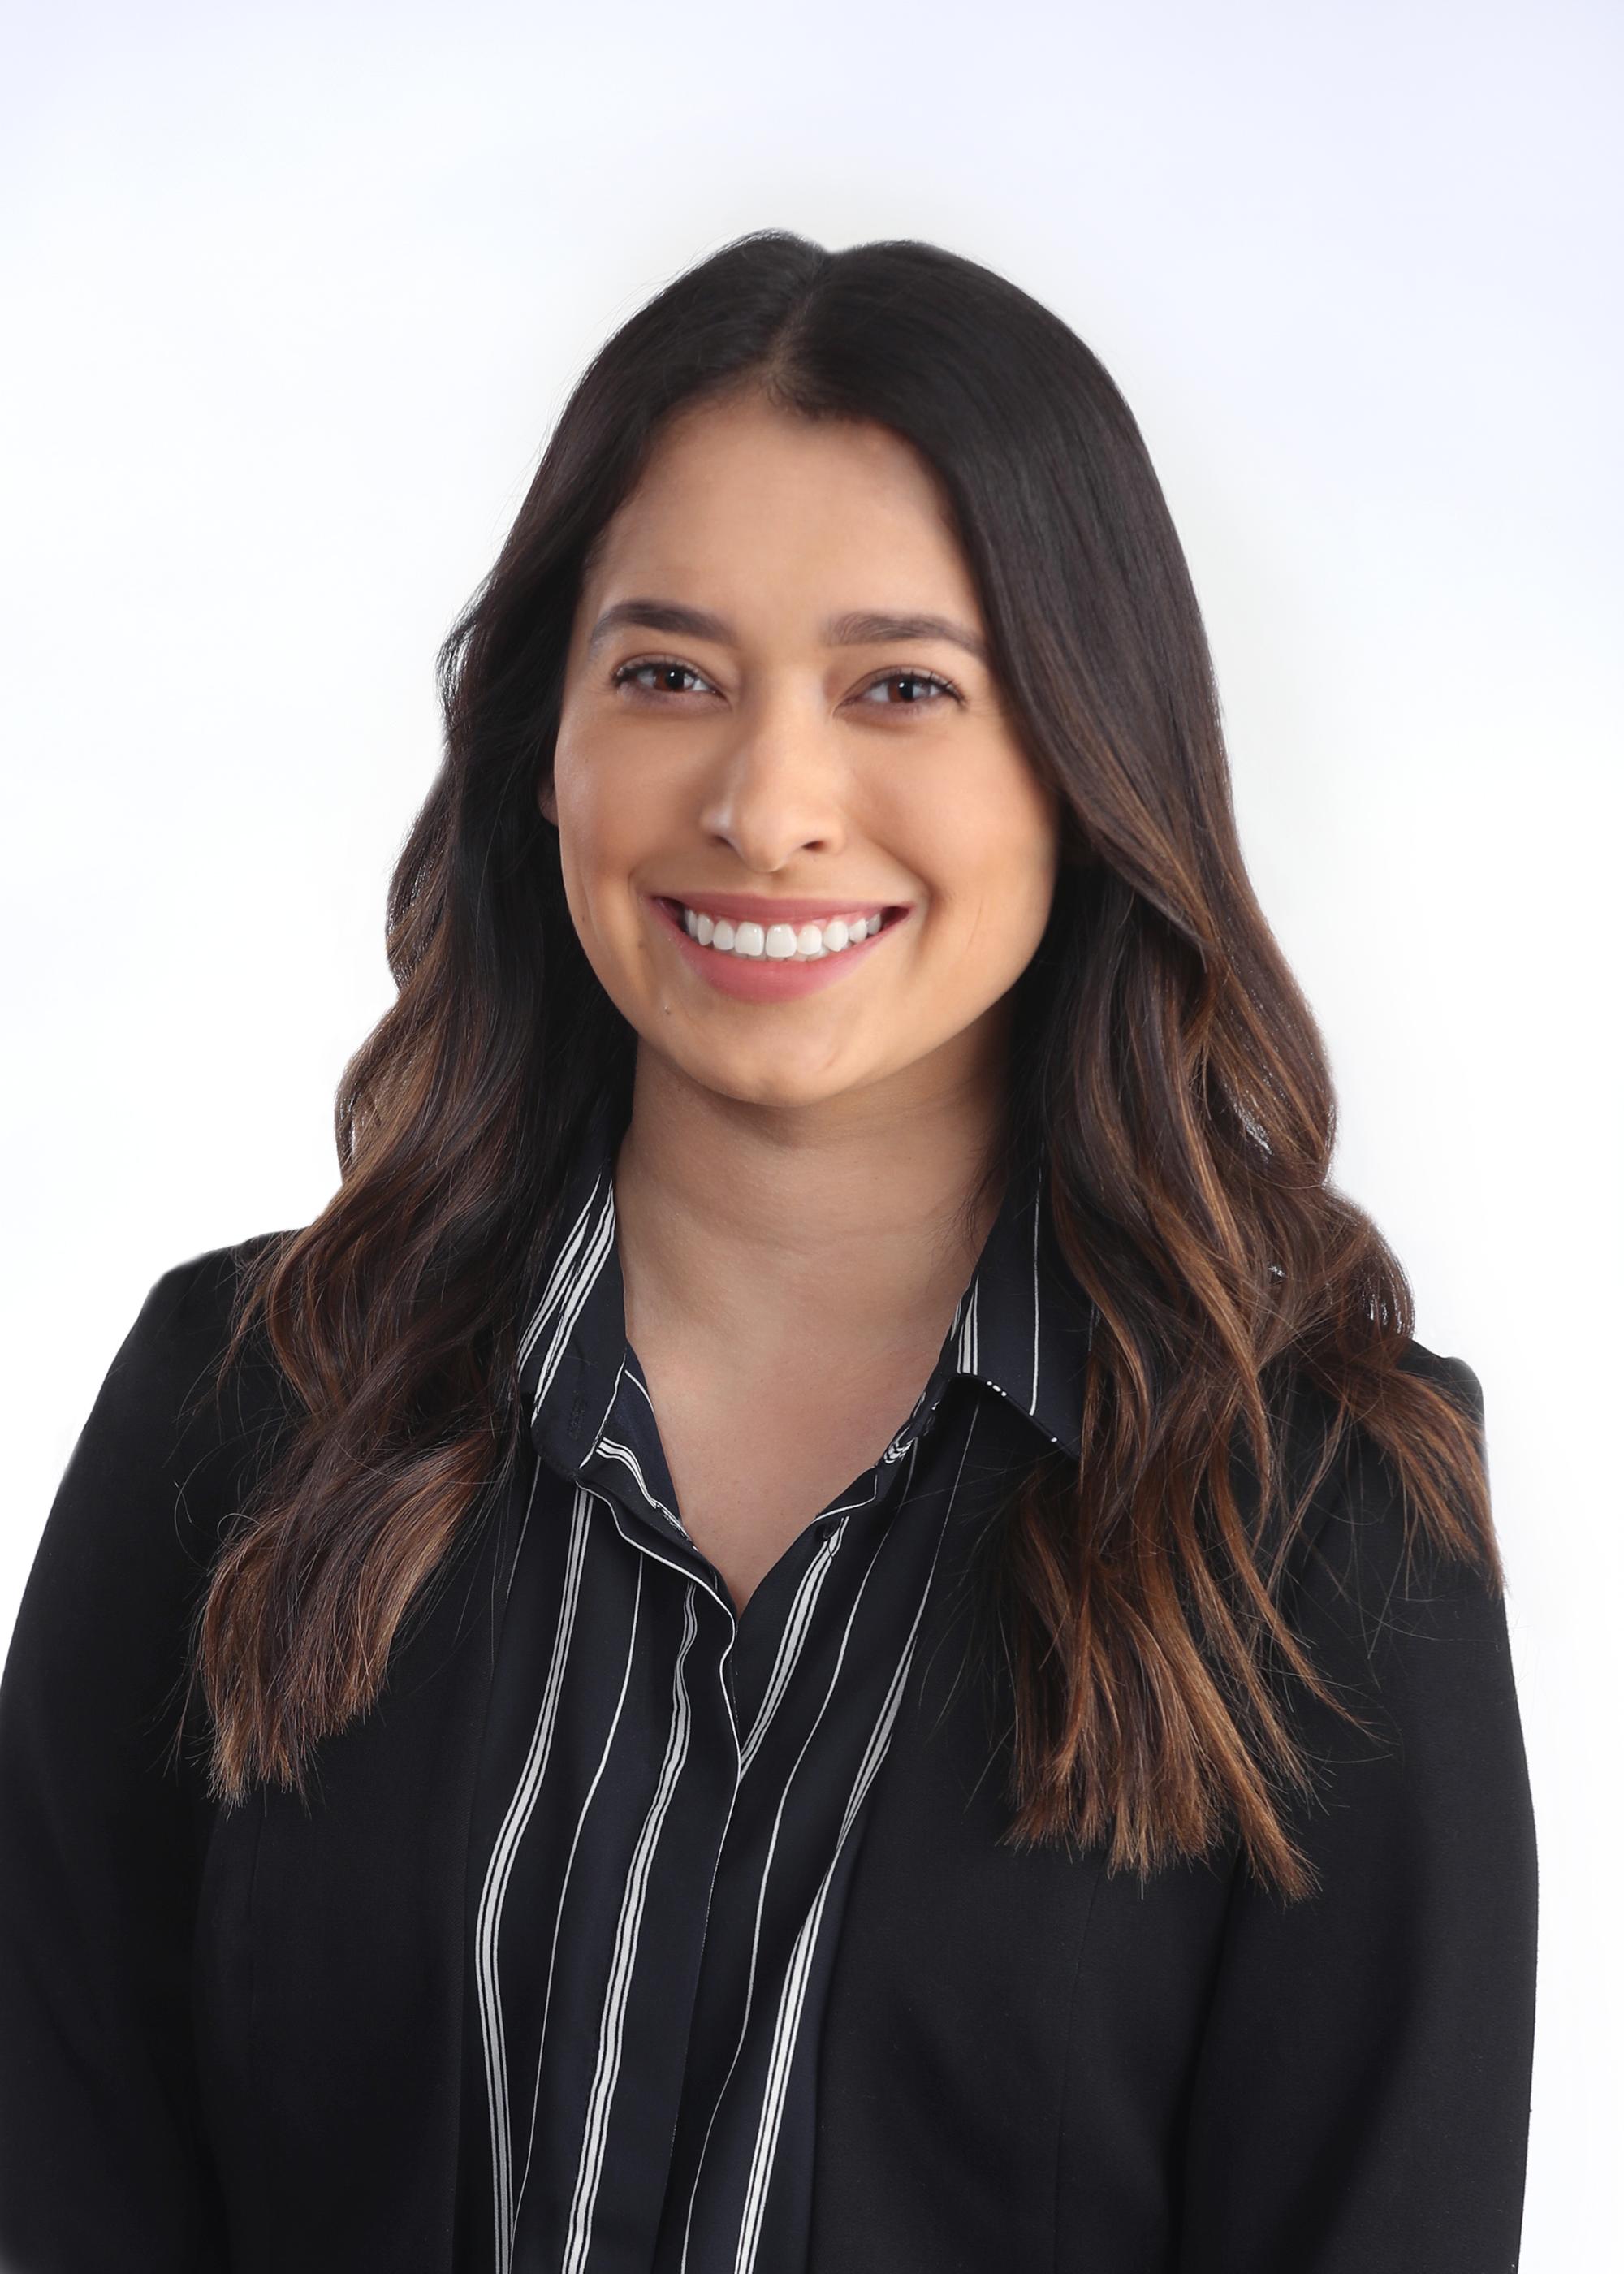 Danielle Rodriguez  Assistant Project Coordinator